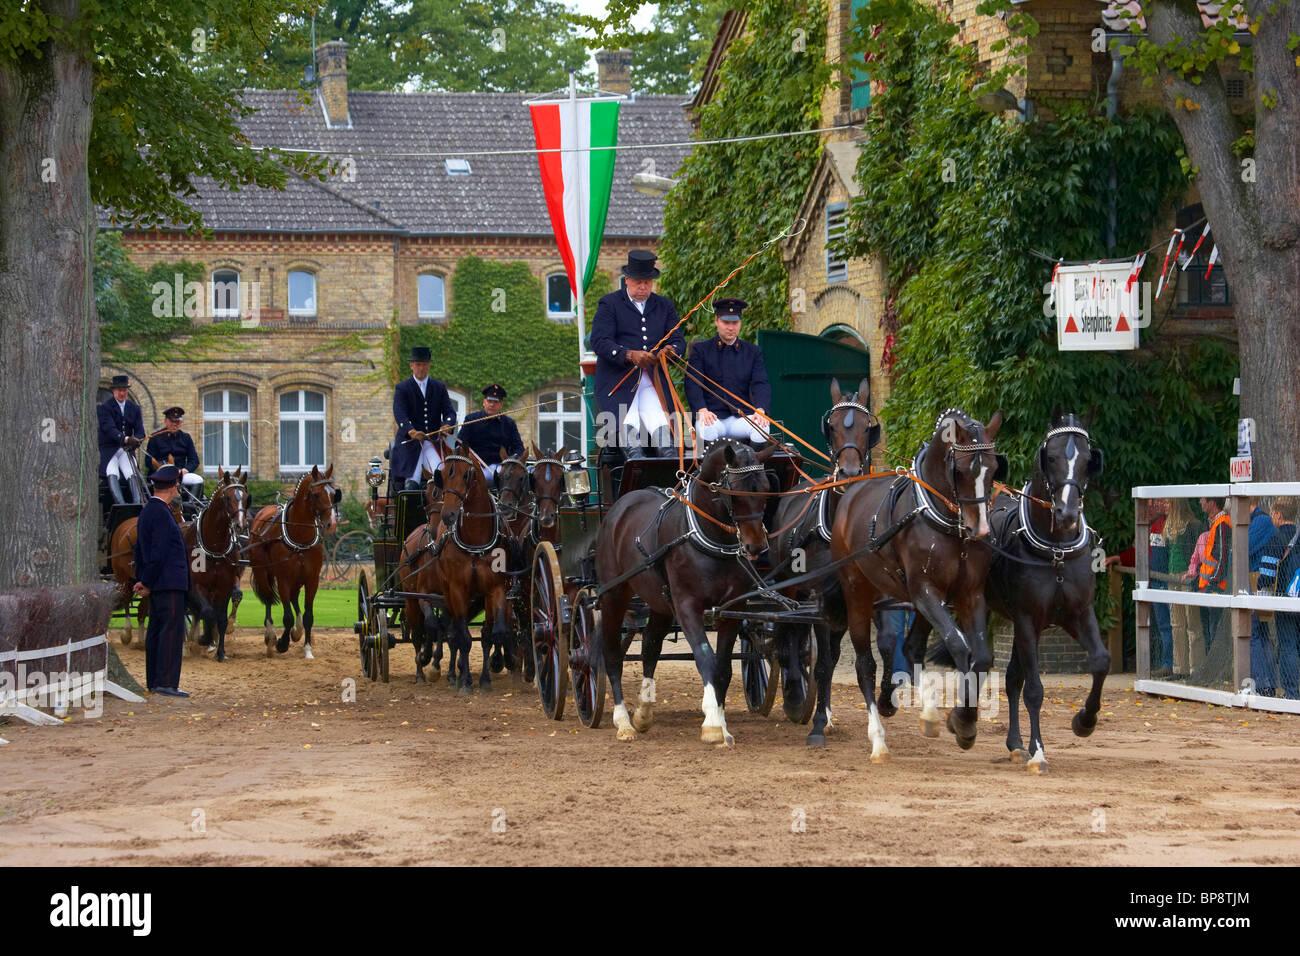 Outdoor photo, Stallion Parade, State Stud, Warendorf, Muensterland, North Rhine-Westphalia, Germany, Europe - Stock Image